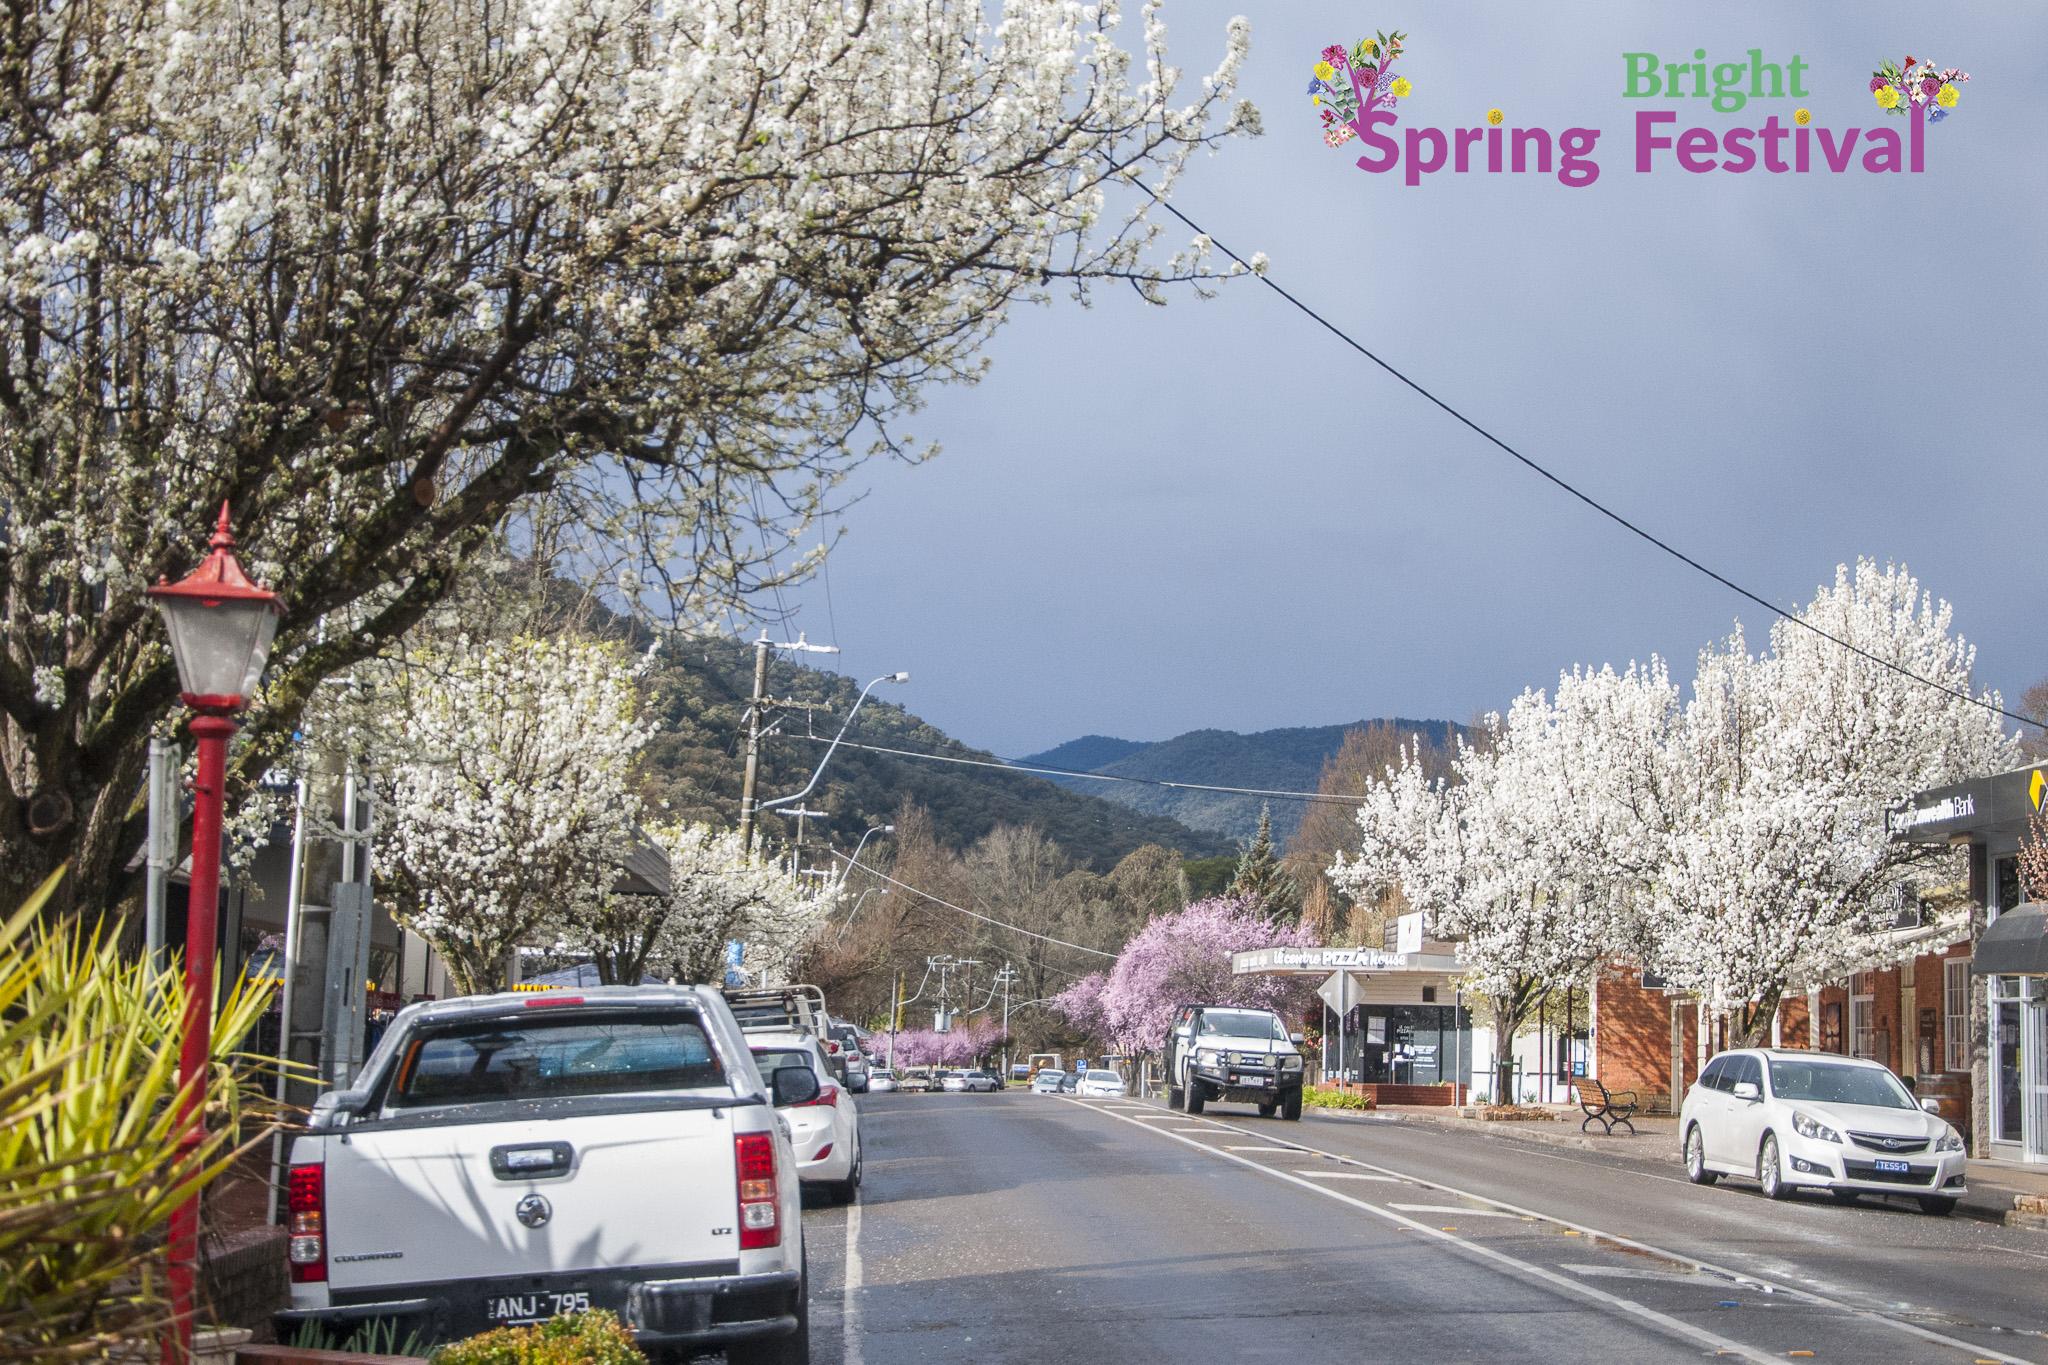 Brigh Spring Festival 1609 - 016